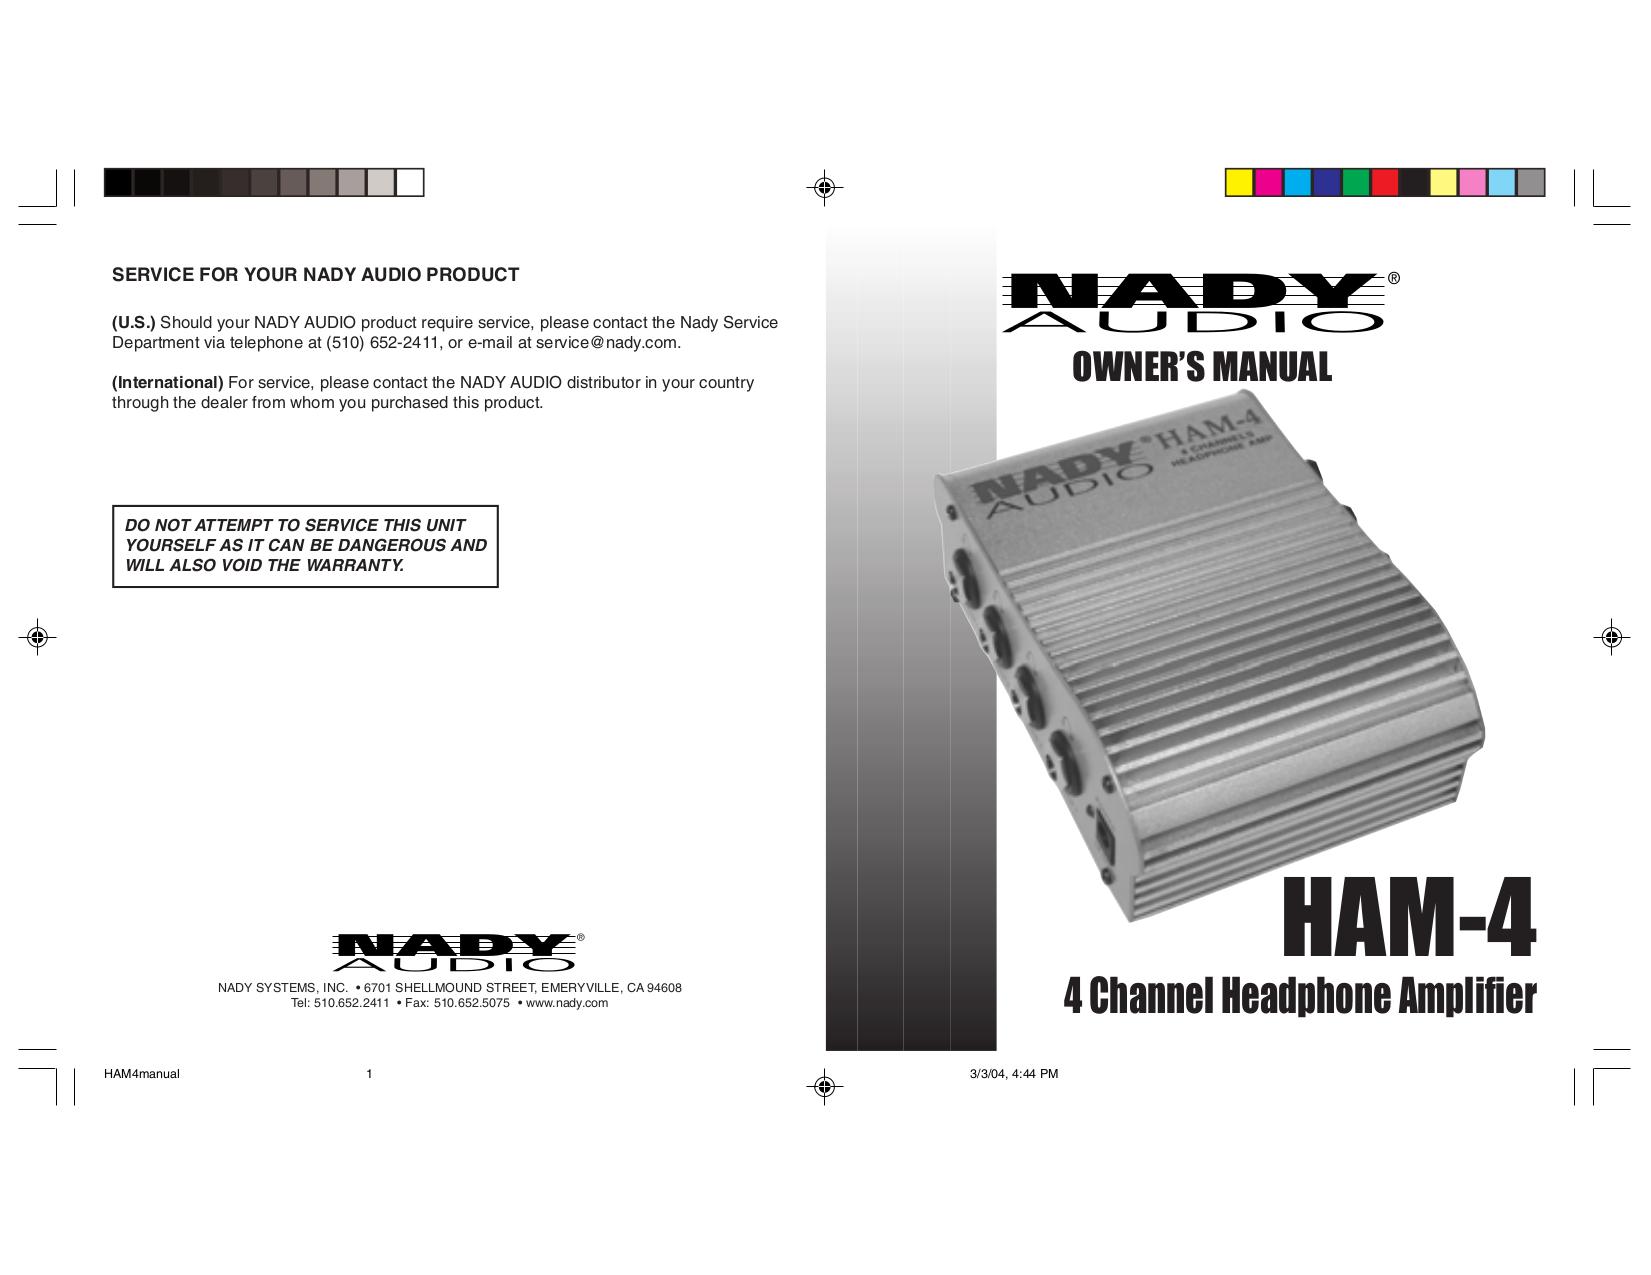 pdf for Nady Amp HAM-4 manual